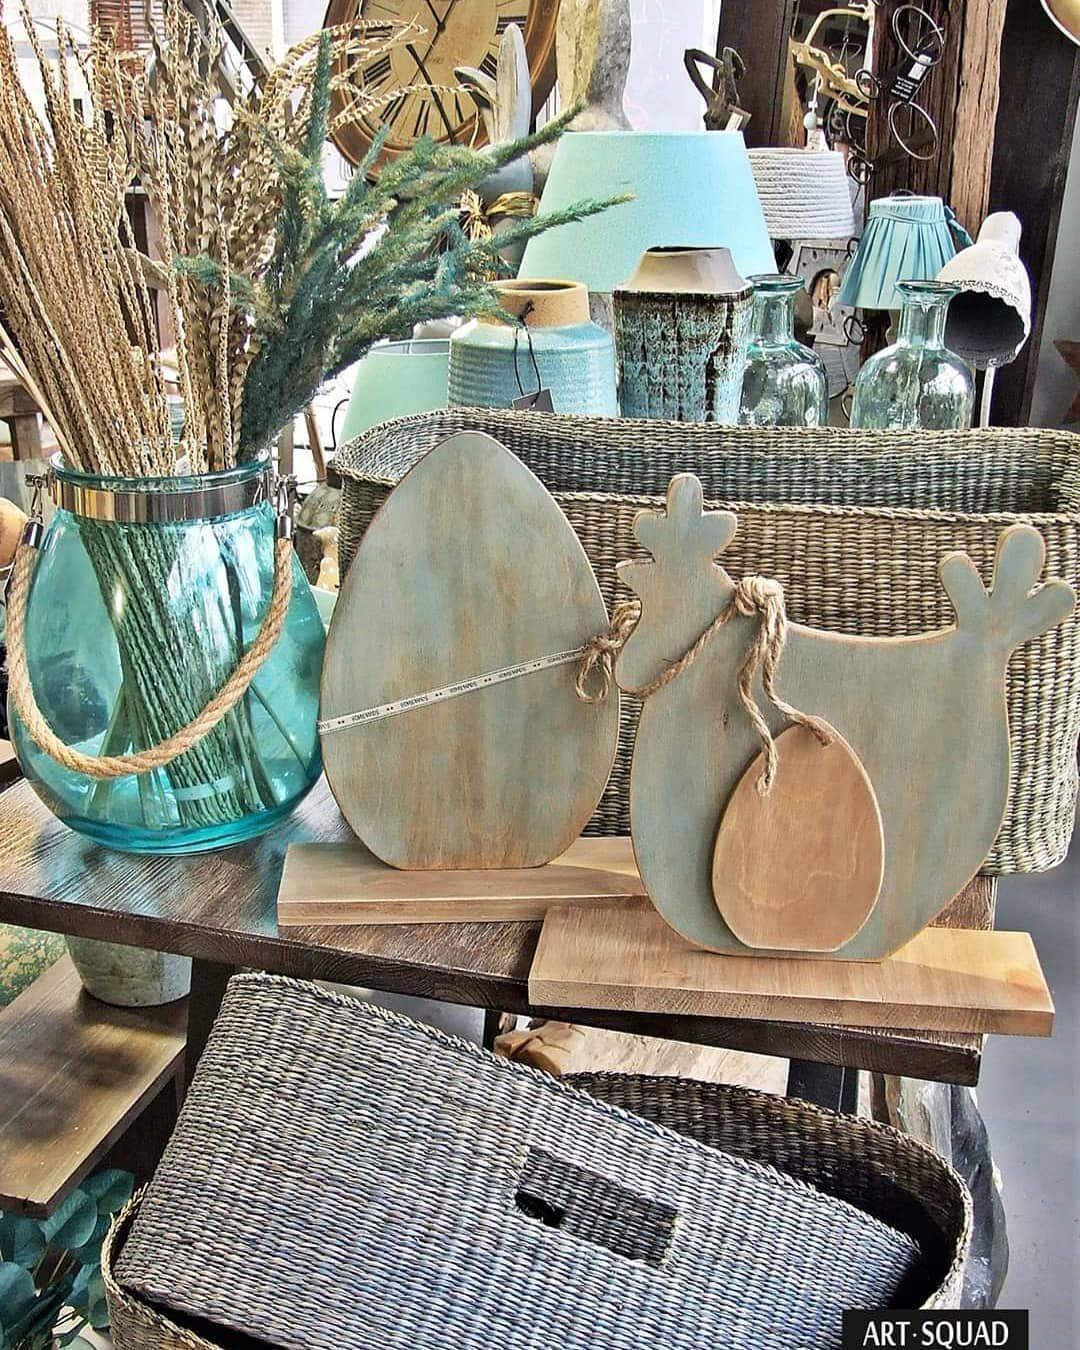 Kura i Jajo Para Idealna 😀😉 #oryginalnedekoracje #artsquadtychy #artsquad #dekoracjeswiateczne #dekoracjedodomu #dodatki #wnetrzazesmakiem #drewnianedekoracje #dodatkidodomu #wielkanoc #wielkanocnedekoracje #handmade #dekoracjezdrewna #drewnianedekoracje #kochamydrewno #design #inspiration #interiordesign #woodlove #decor #decoring #homedecor #wooddecor #eastercoming #easterdecor #welovewood #rusticdecor #wood